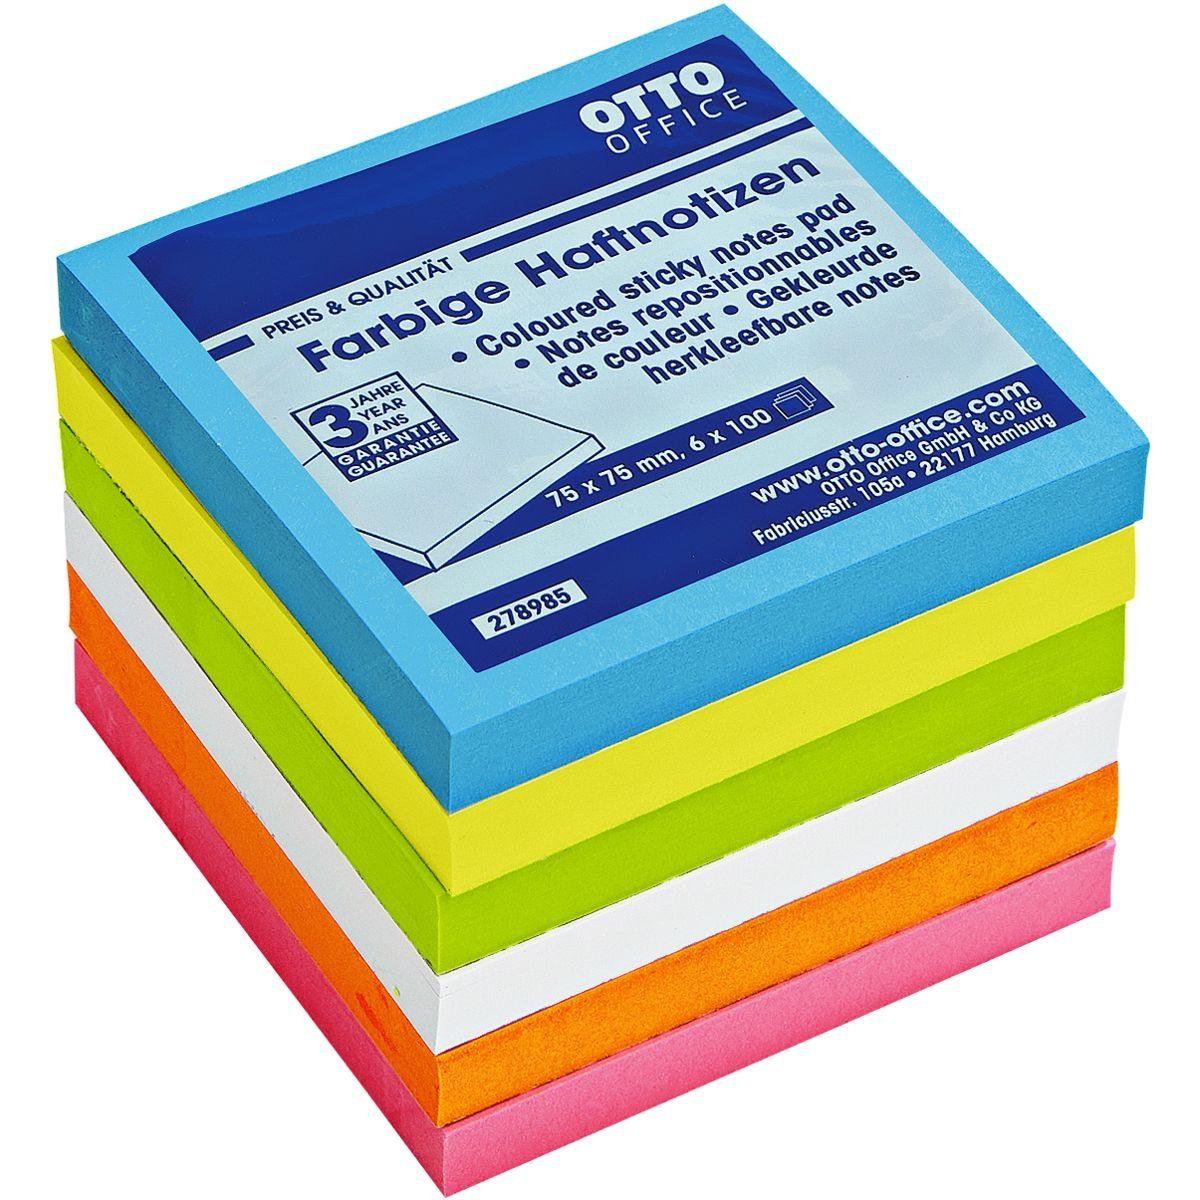 OTTOOFFICE STANDARD Haftnotizblock 7,5 x 7,5 cm, 6 Stück